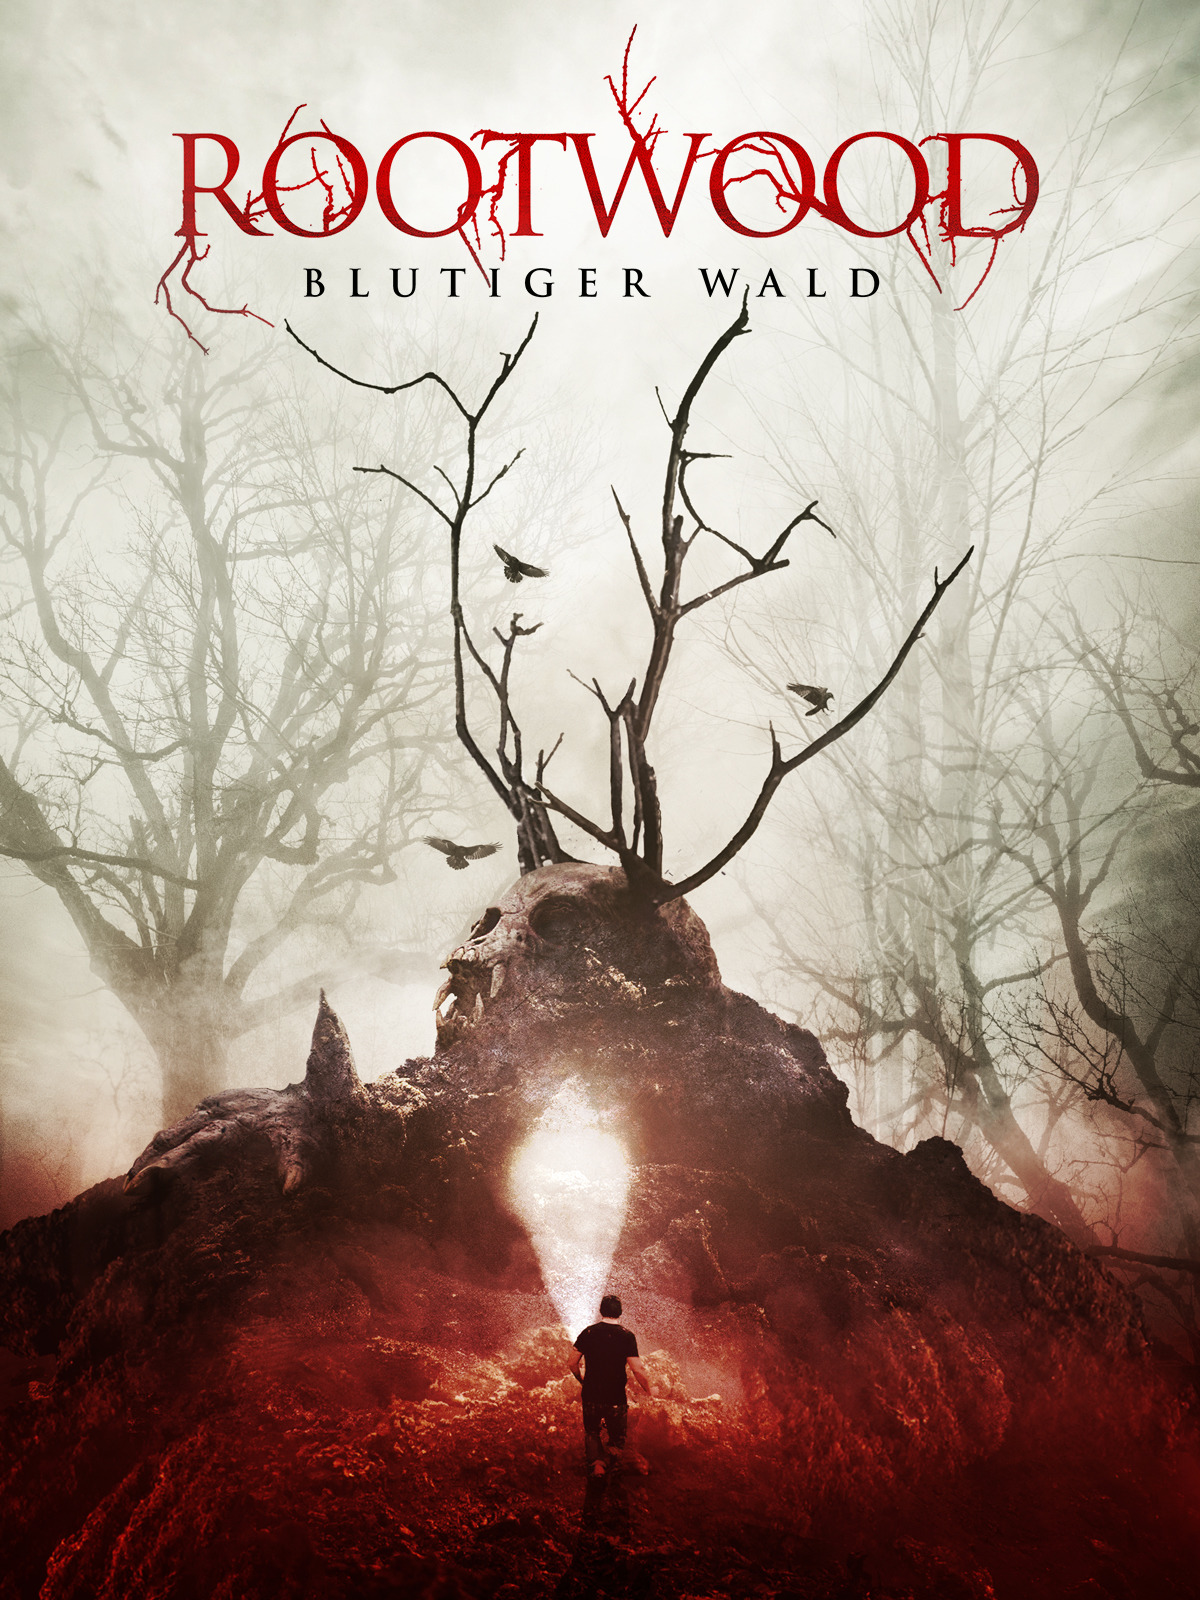 Rootwood - Blutiger Wald